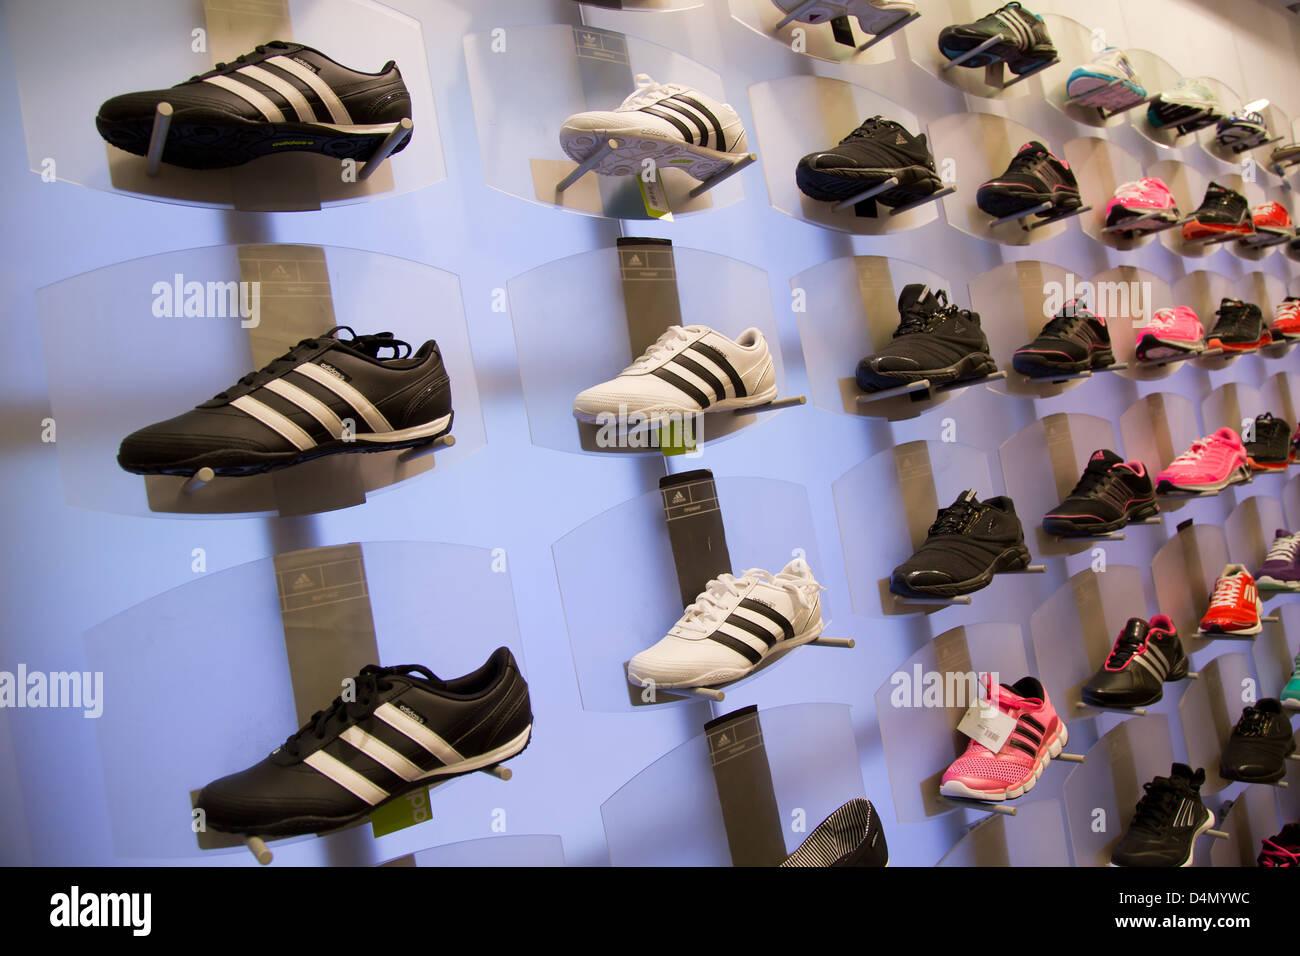 adidas scarpe shop